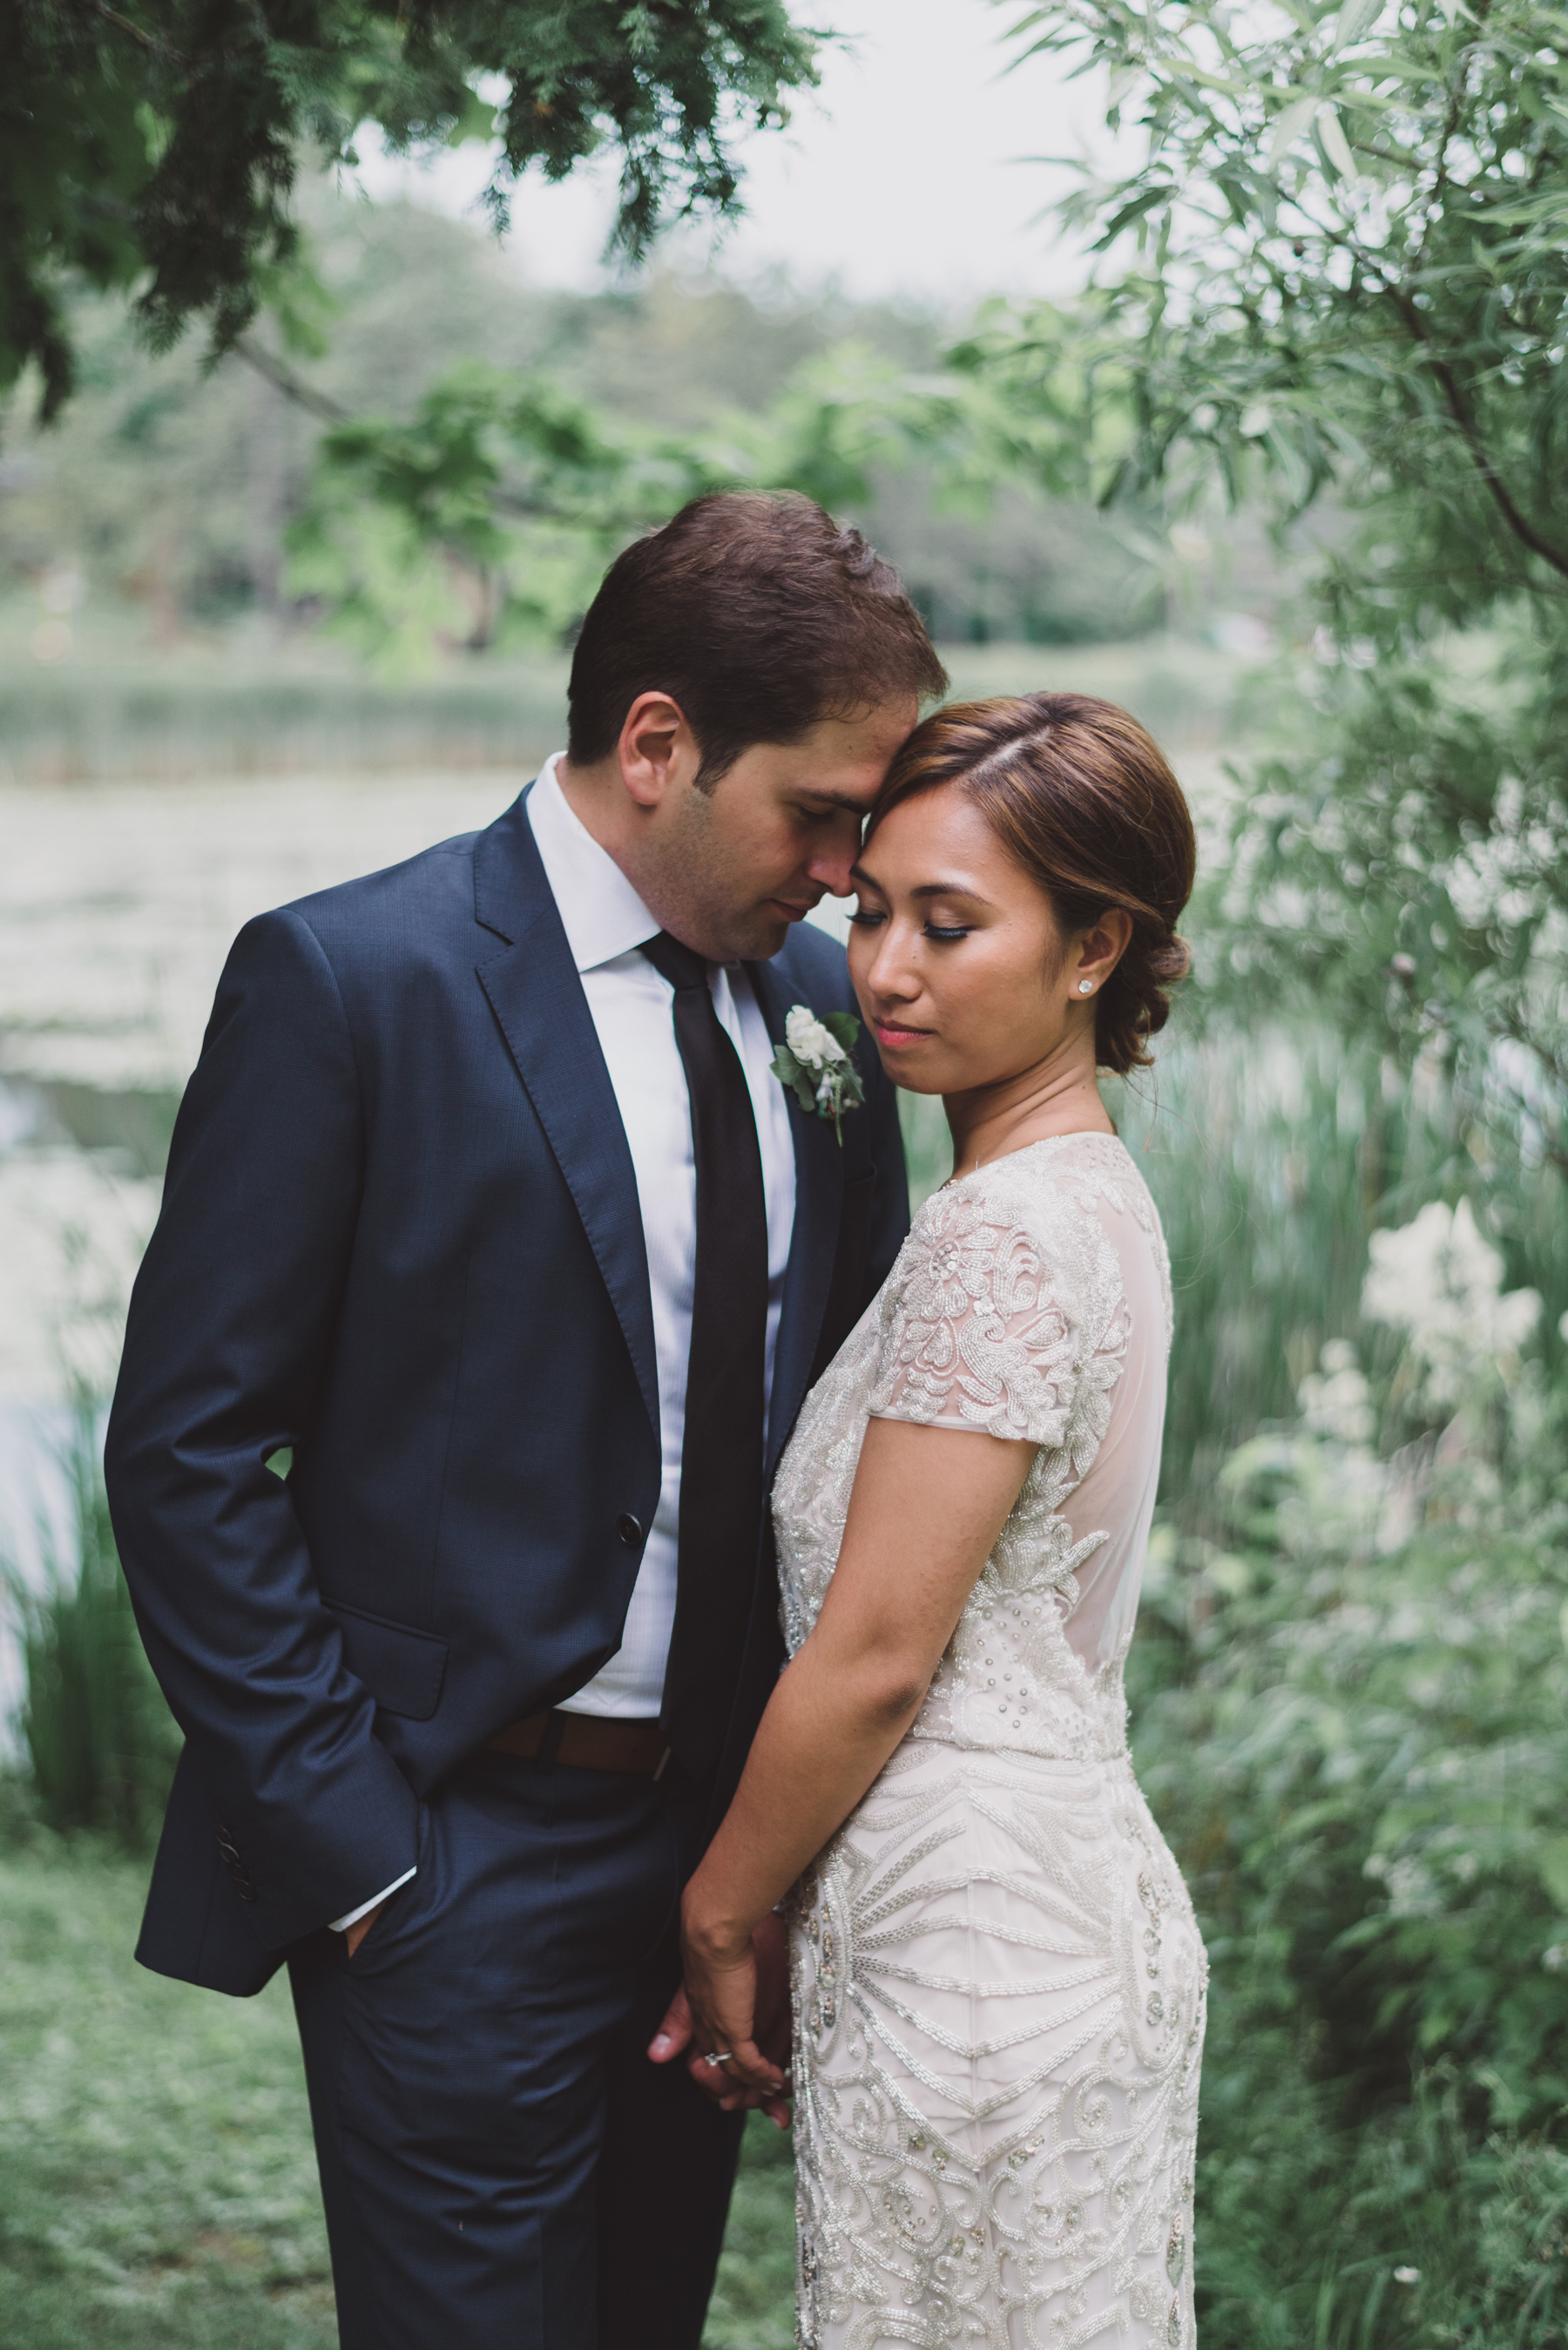 LVImagery-WeddingBells-DianaSohrab-32.JPG